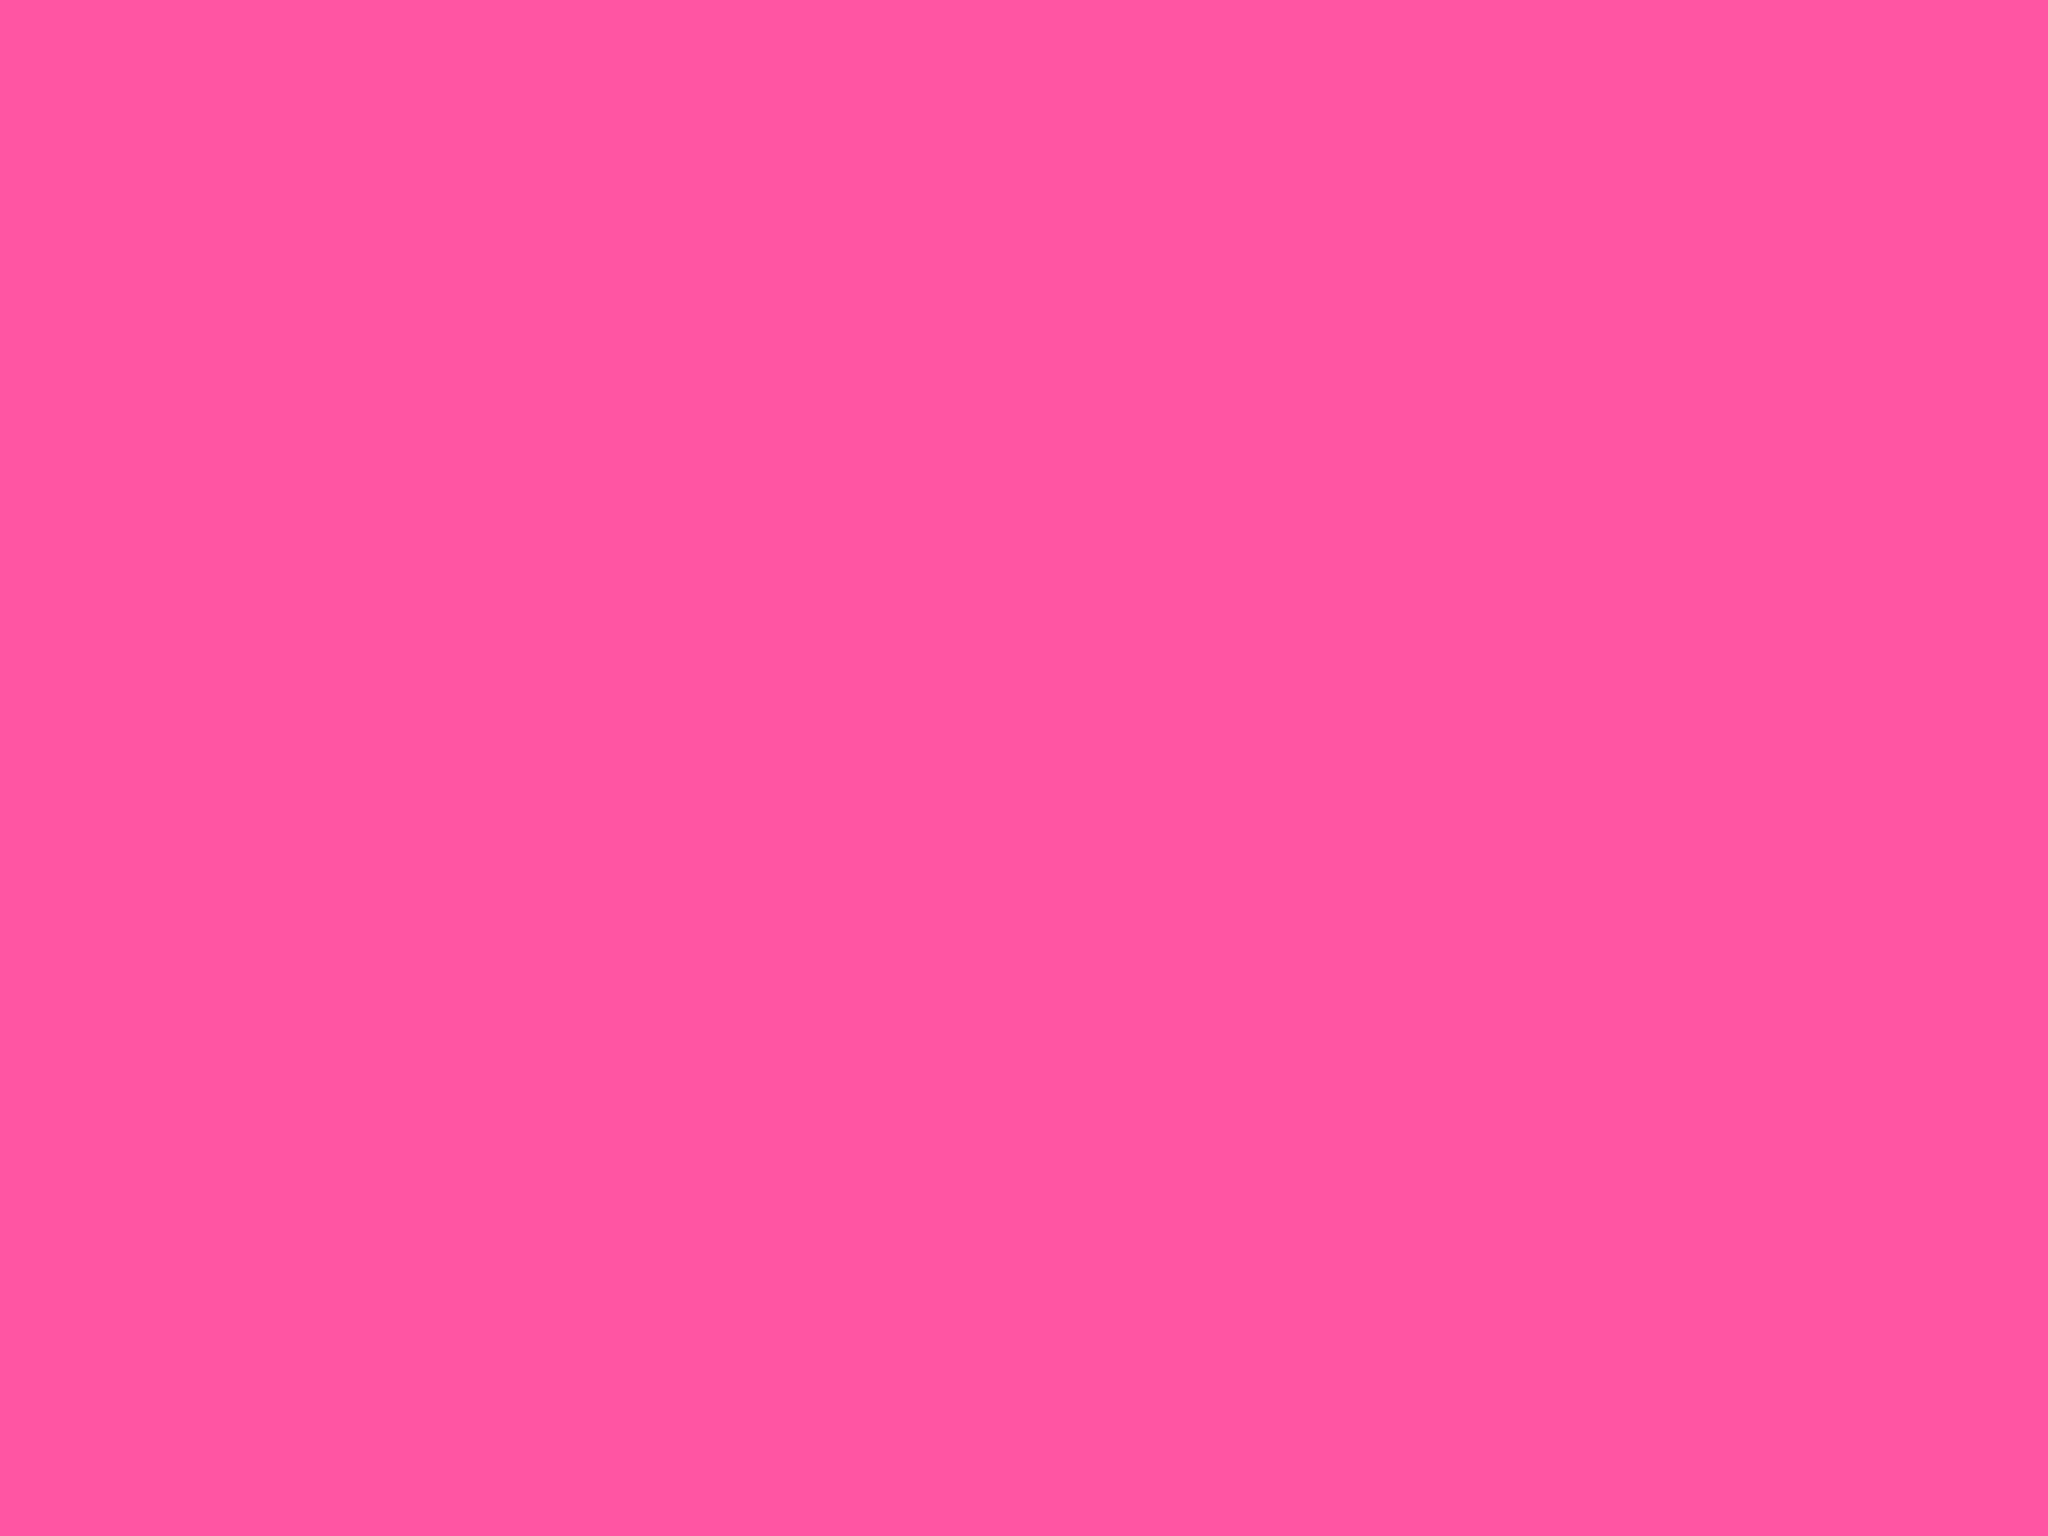 2048x1536 Brilliant Rose Solid Color Background